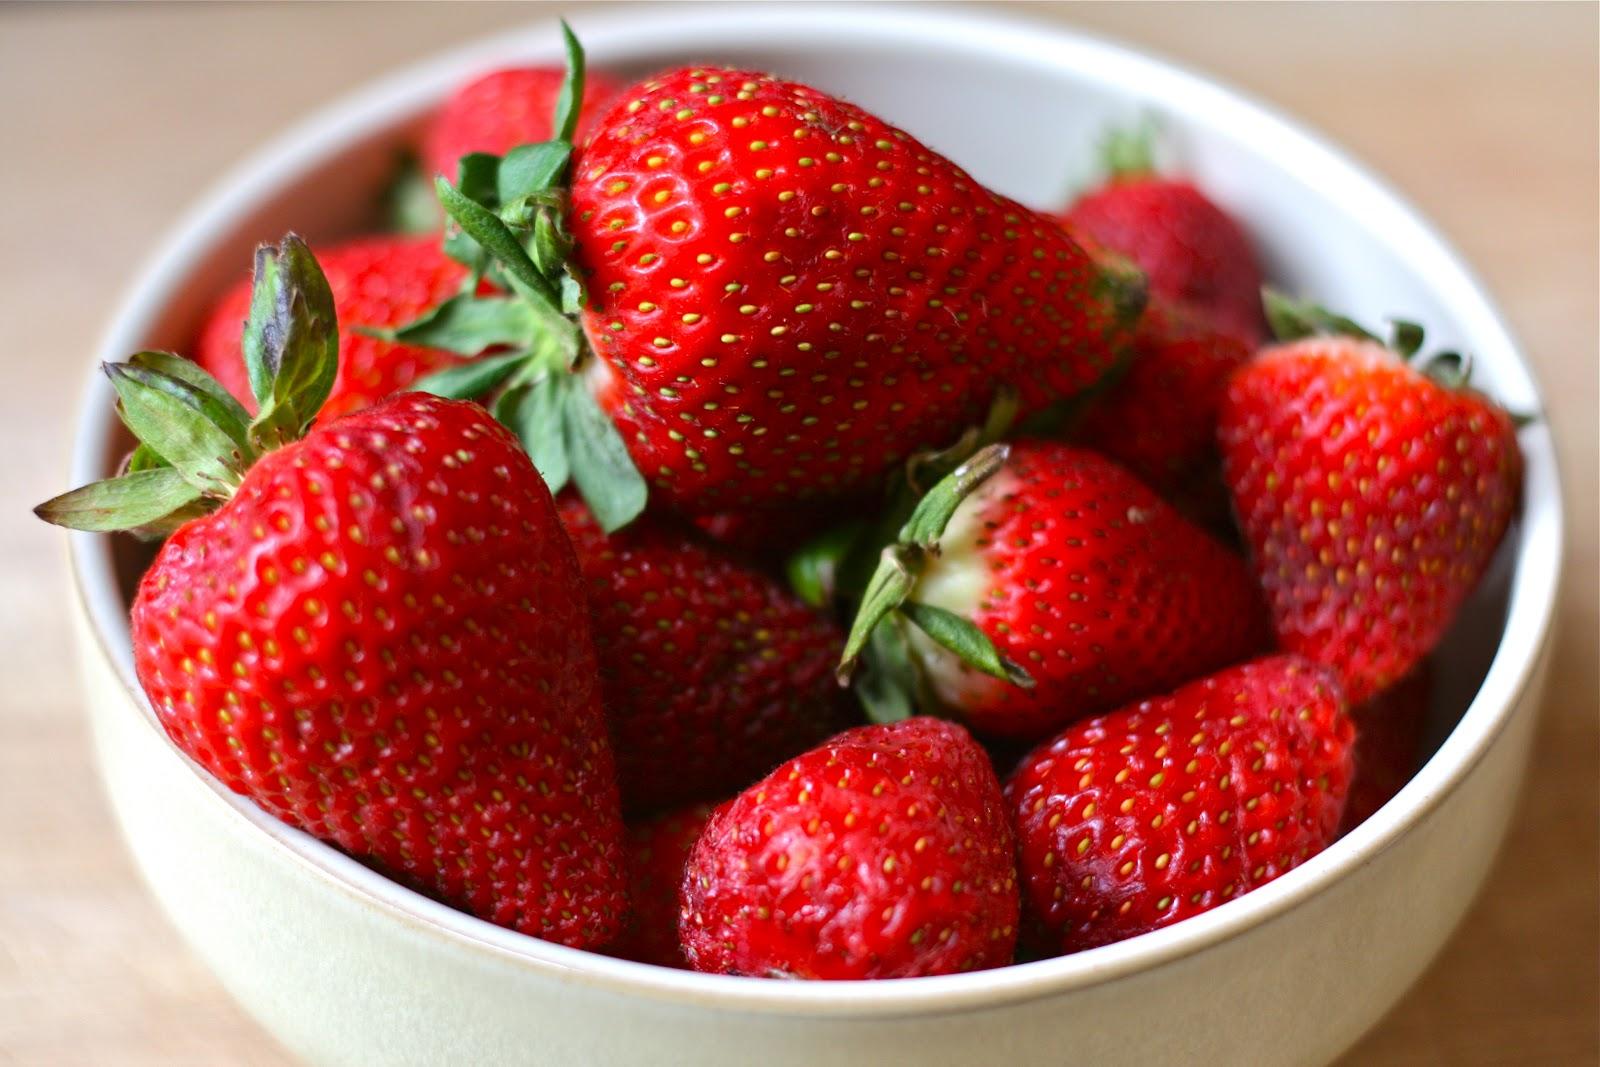 7 Surprising Health Benefits of Strawberries